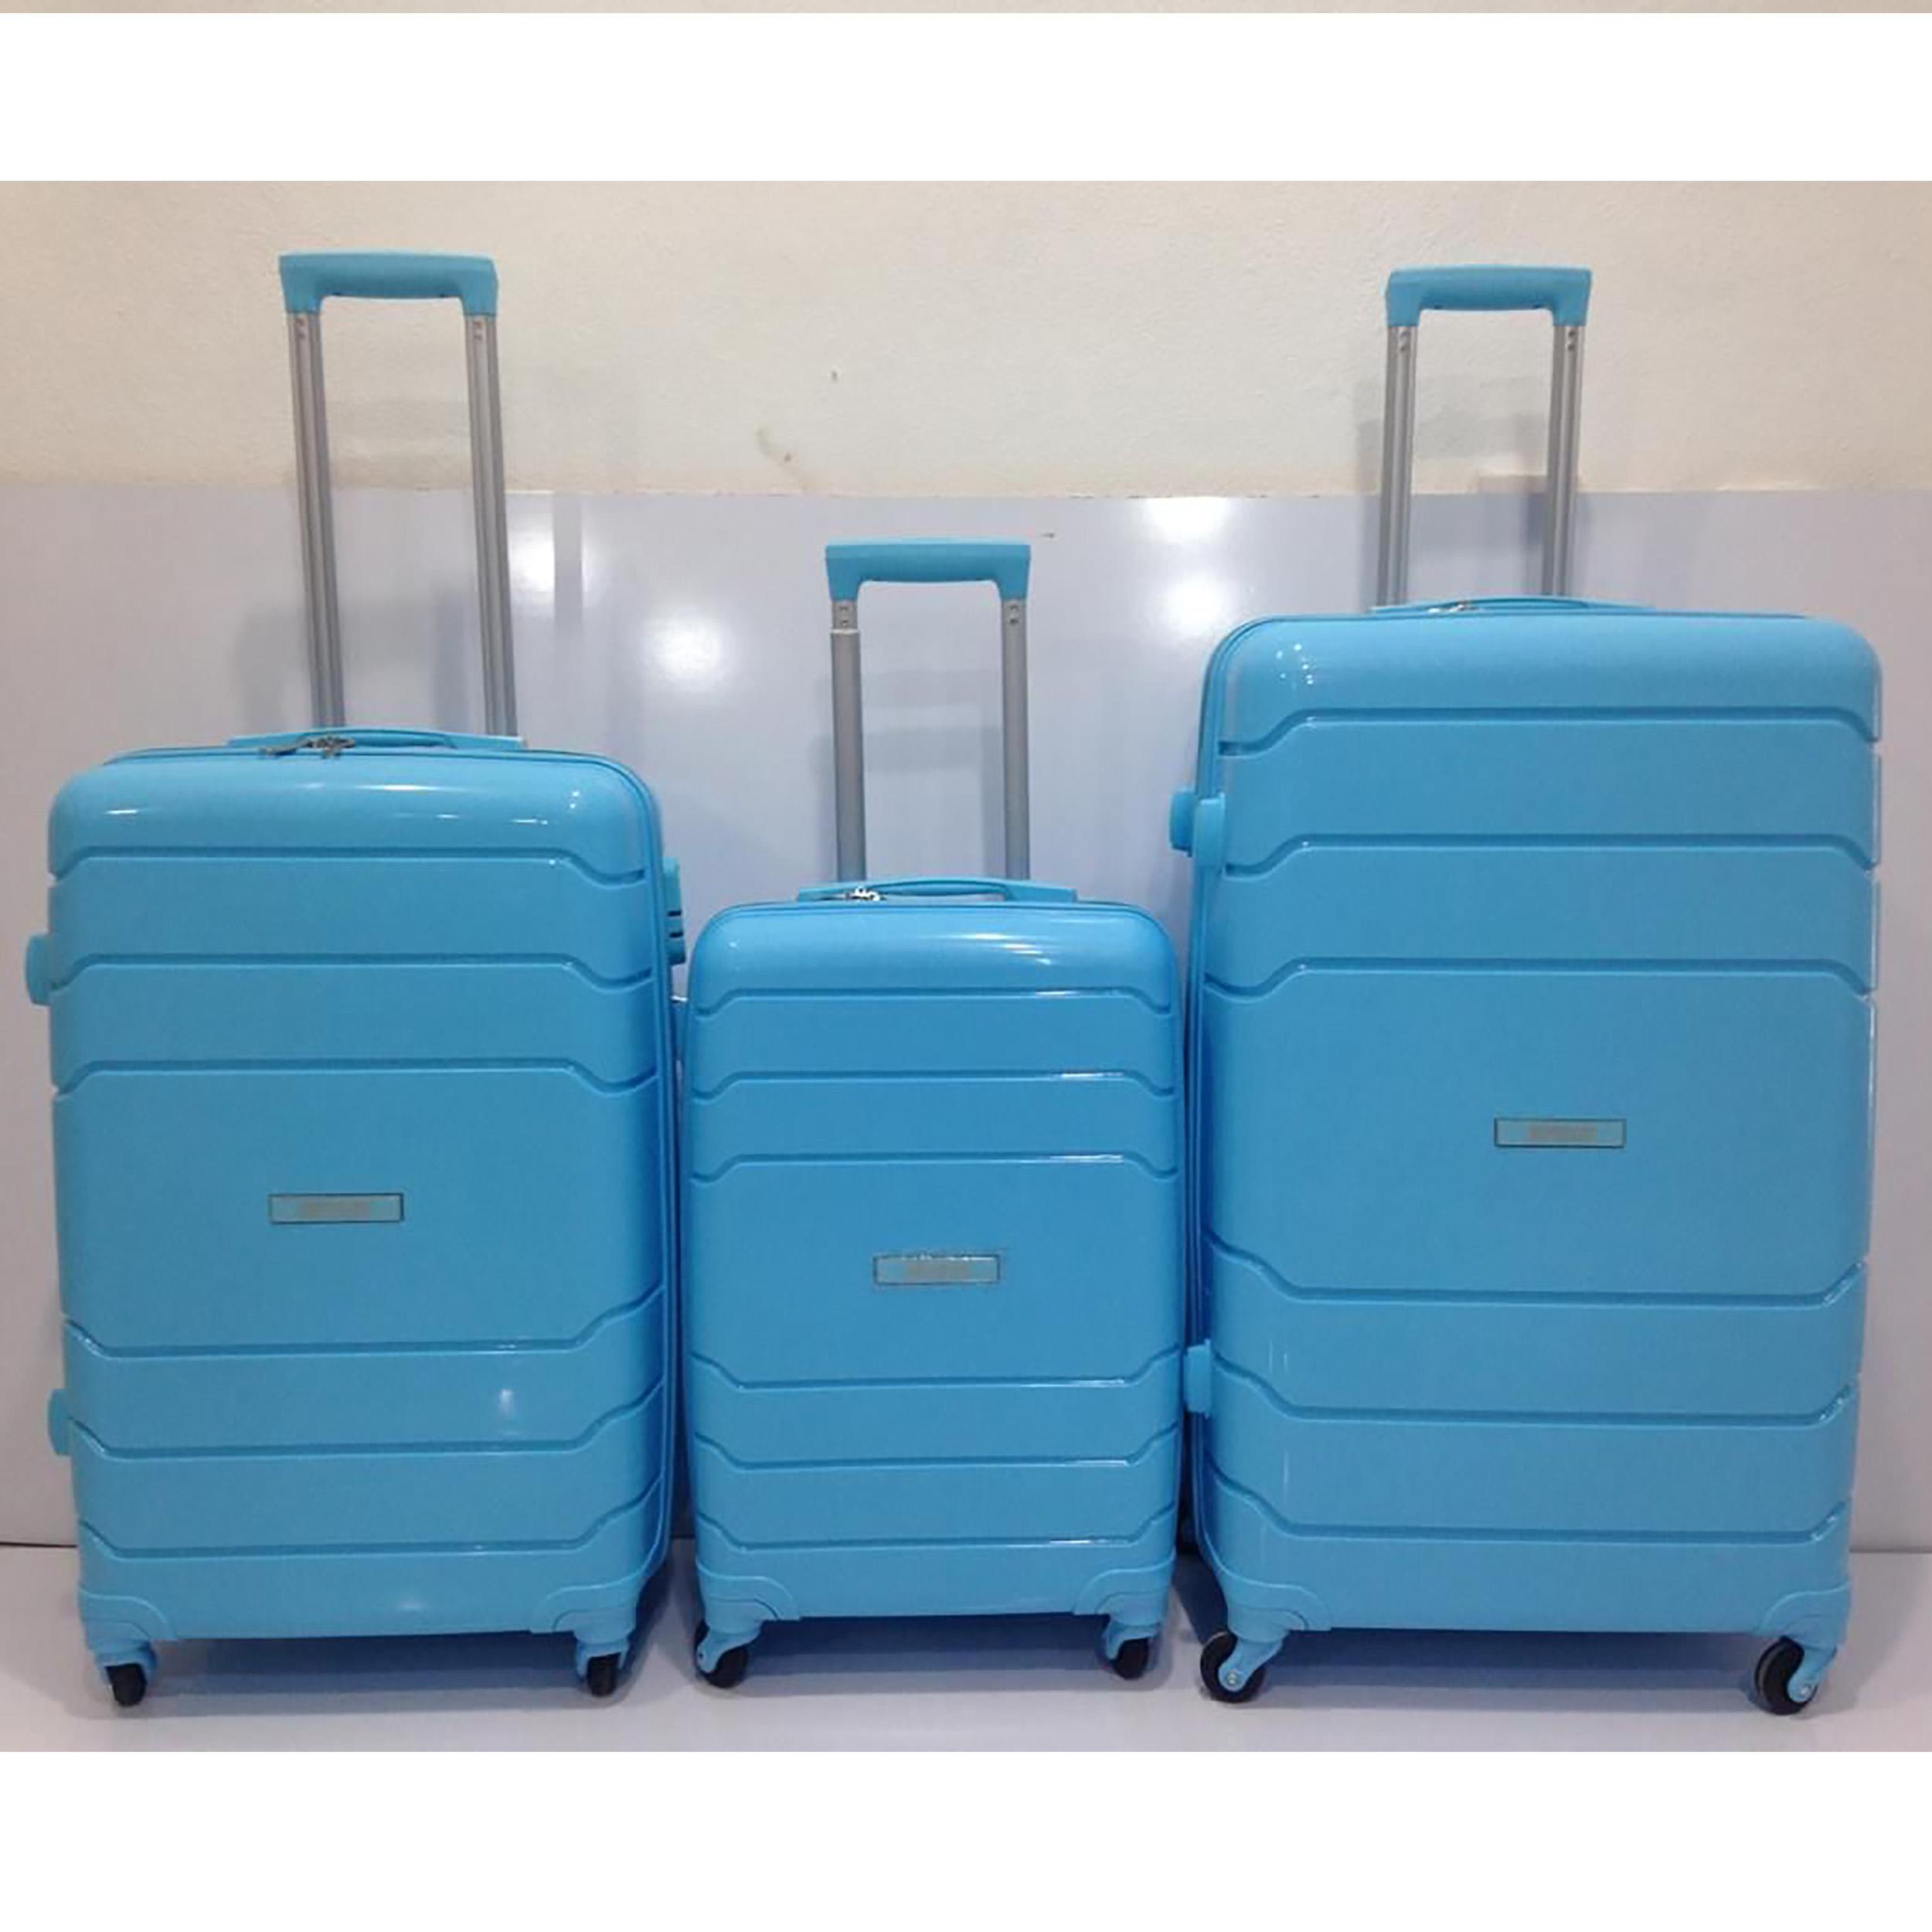 مجموعه سه عددی چمدان اسپید کد B016 main 1 11